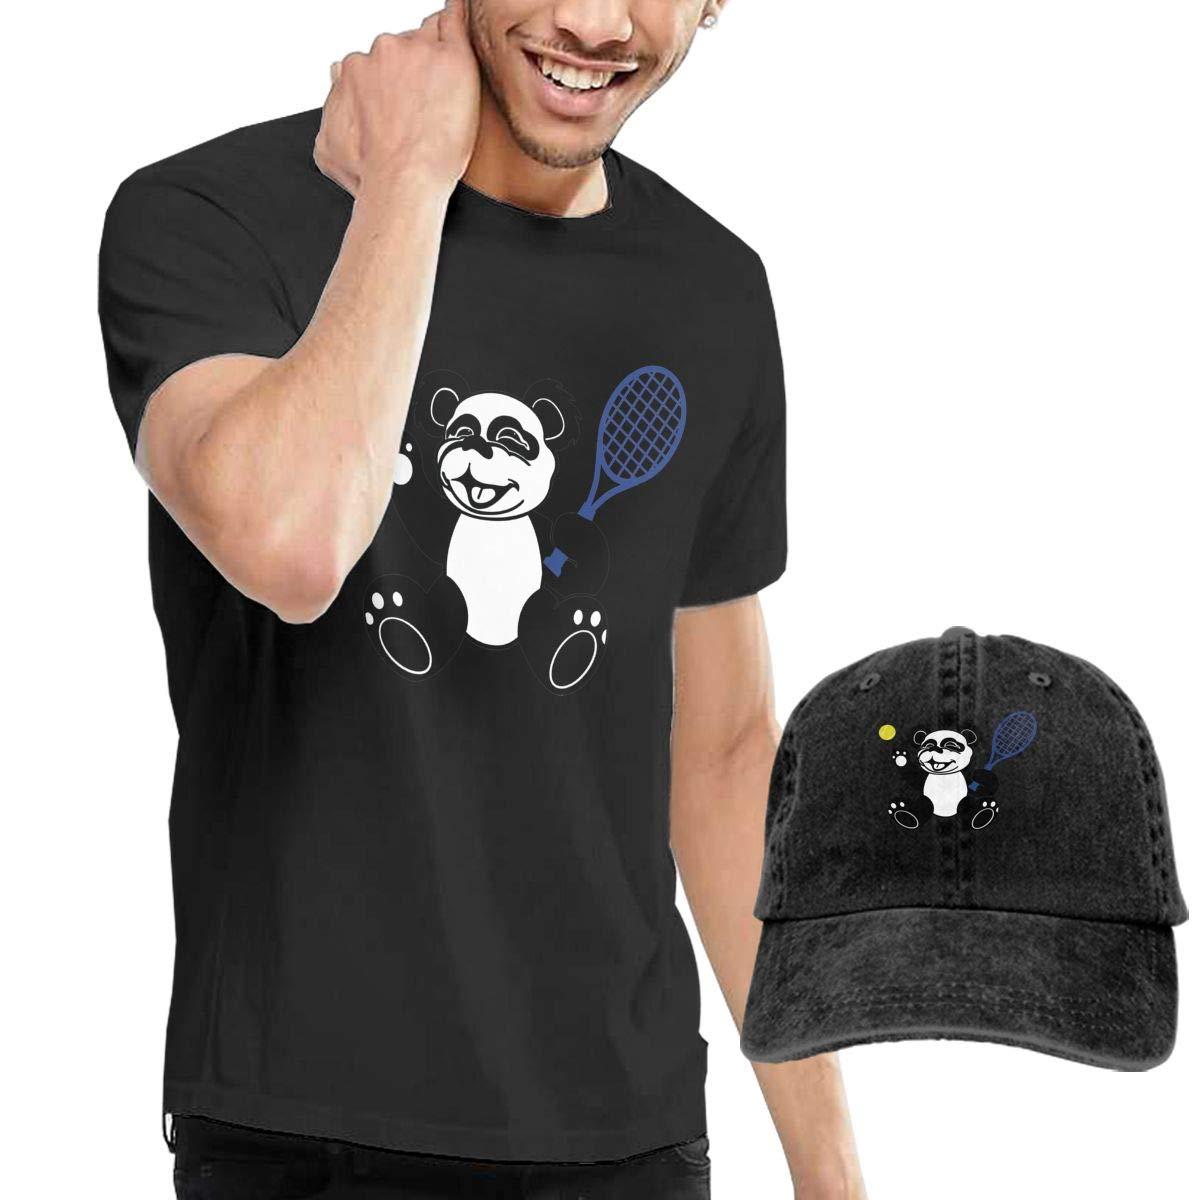 QqZXD Panda Tennis Fashion Mens T-Shirt and Hats Youth /& Adult T-Shirts